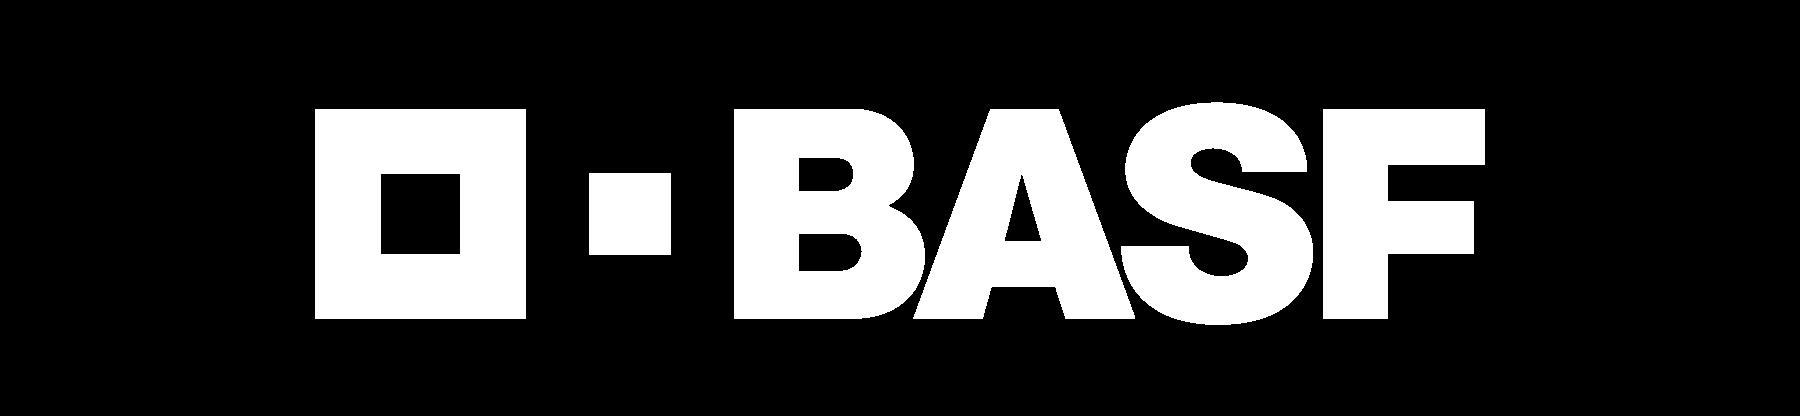 Basf Logos.